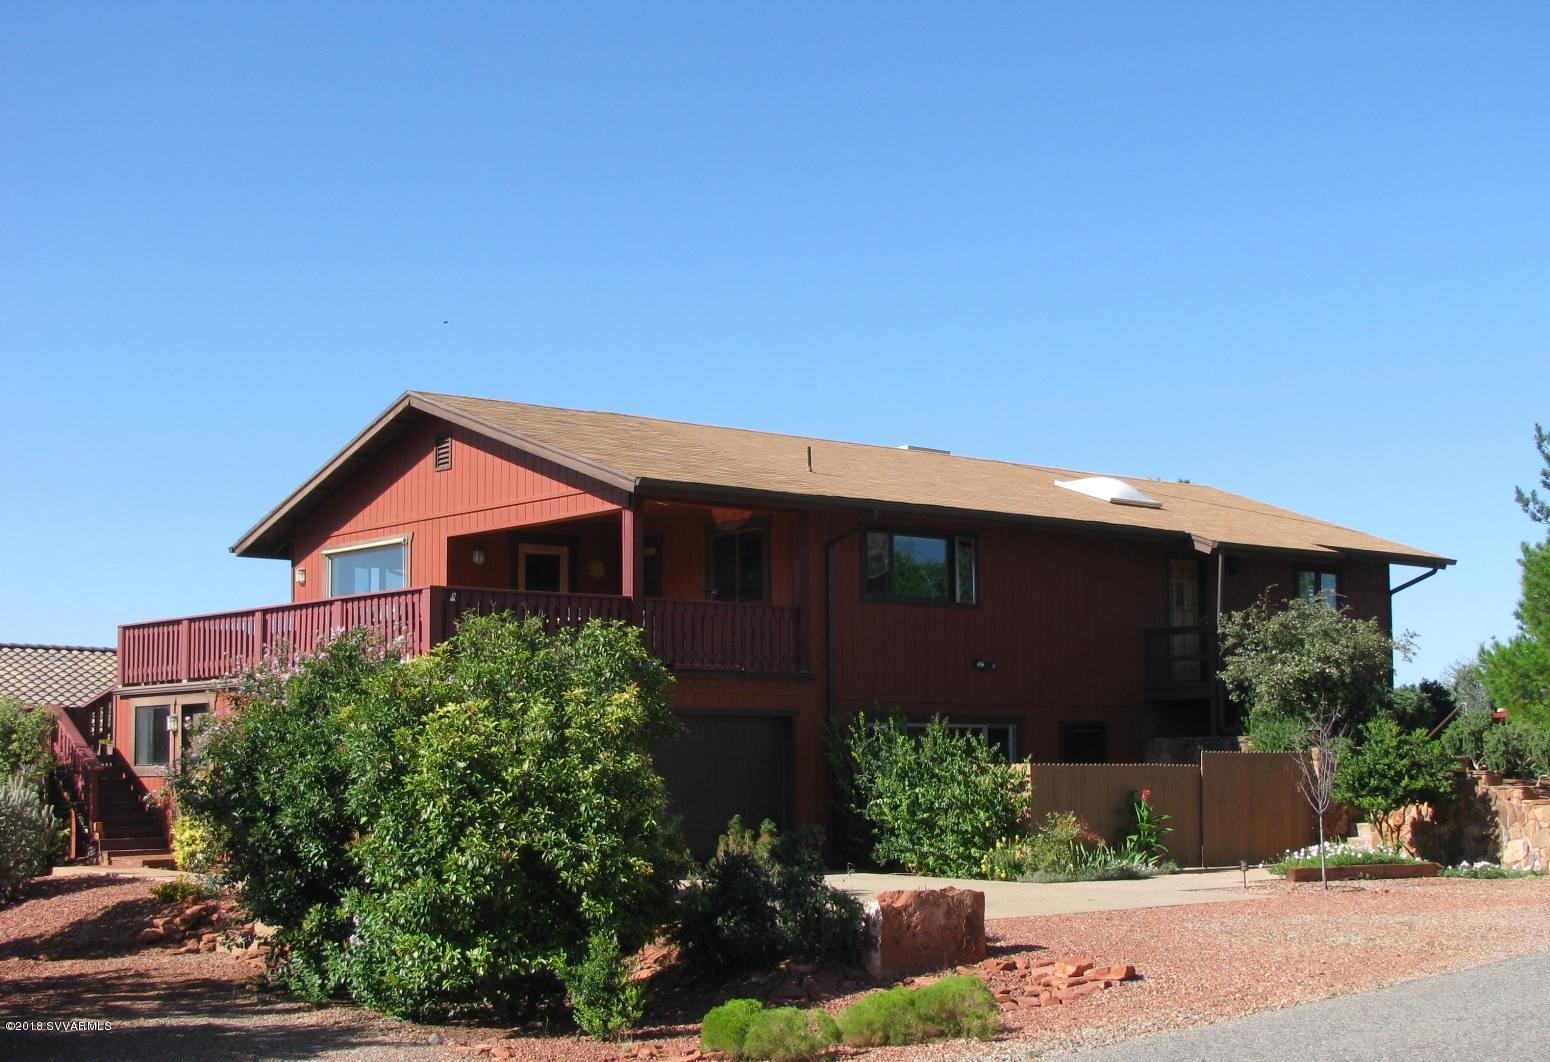 2505 Whippet Way Sedona, AZ 86336